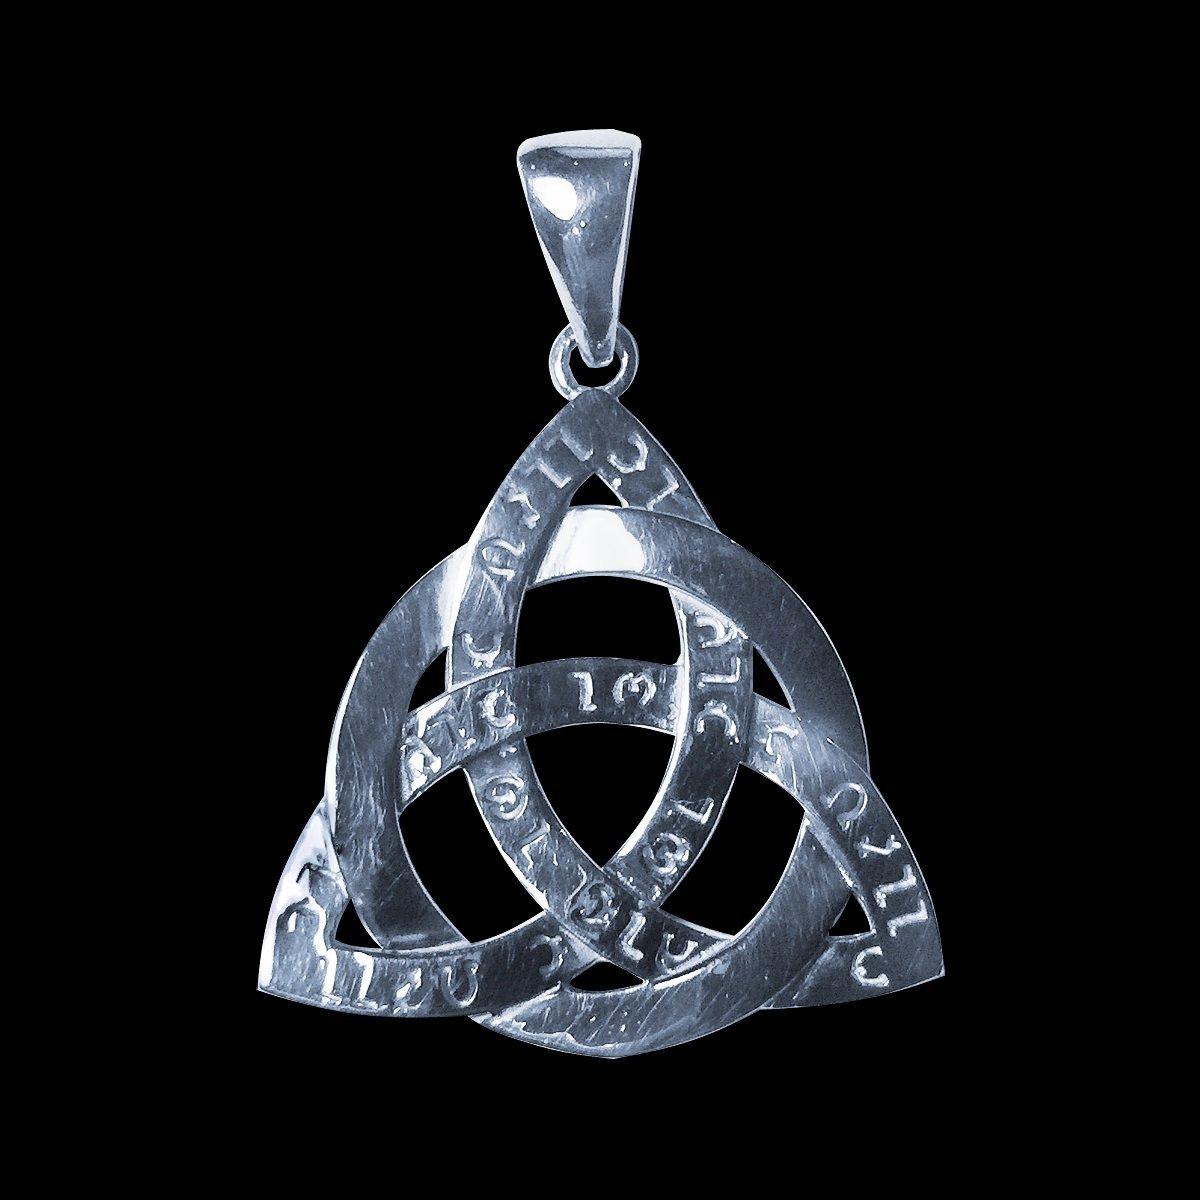 Amulett-keltische Knoten-Triquetra Antike Energien-Kraft Trinity Silber Sterling